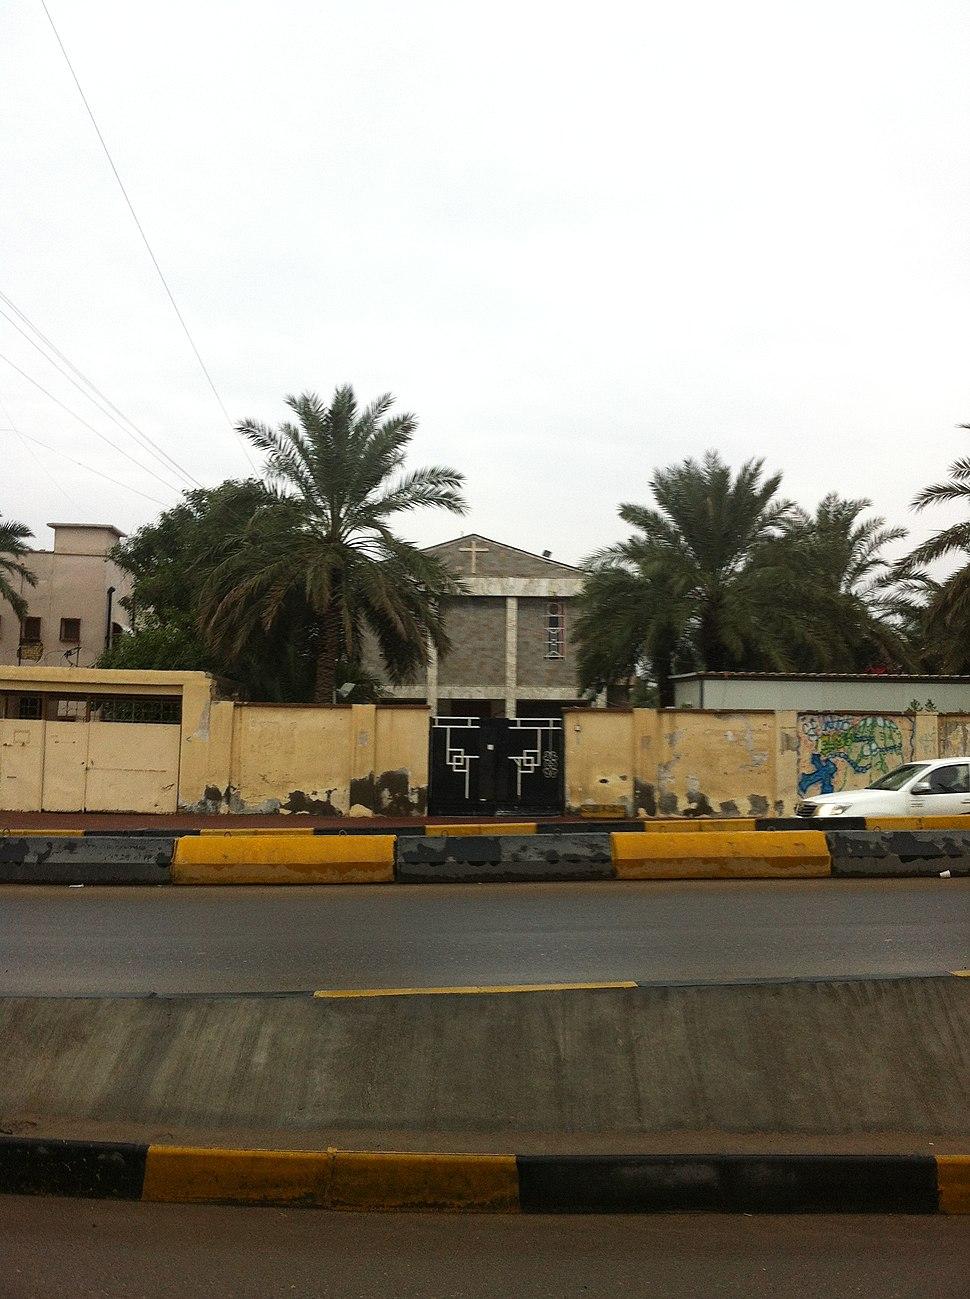 Church-In Basra-Iraq كنيسة في البصرة العراق